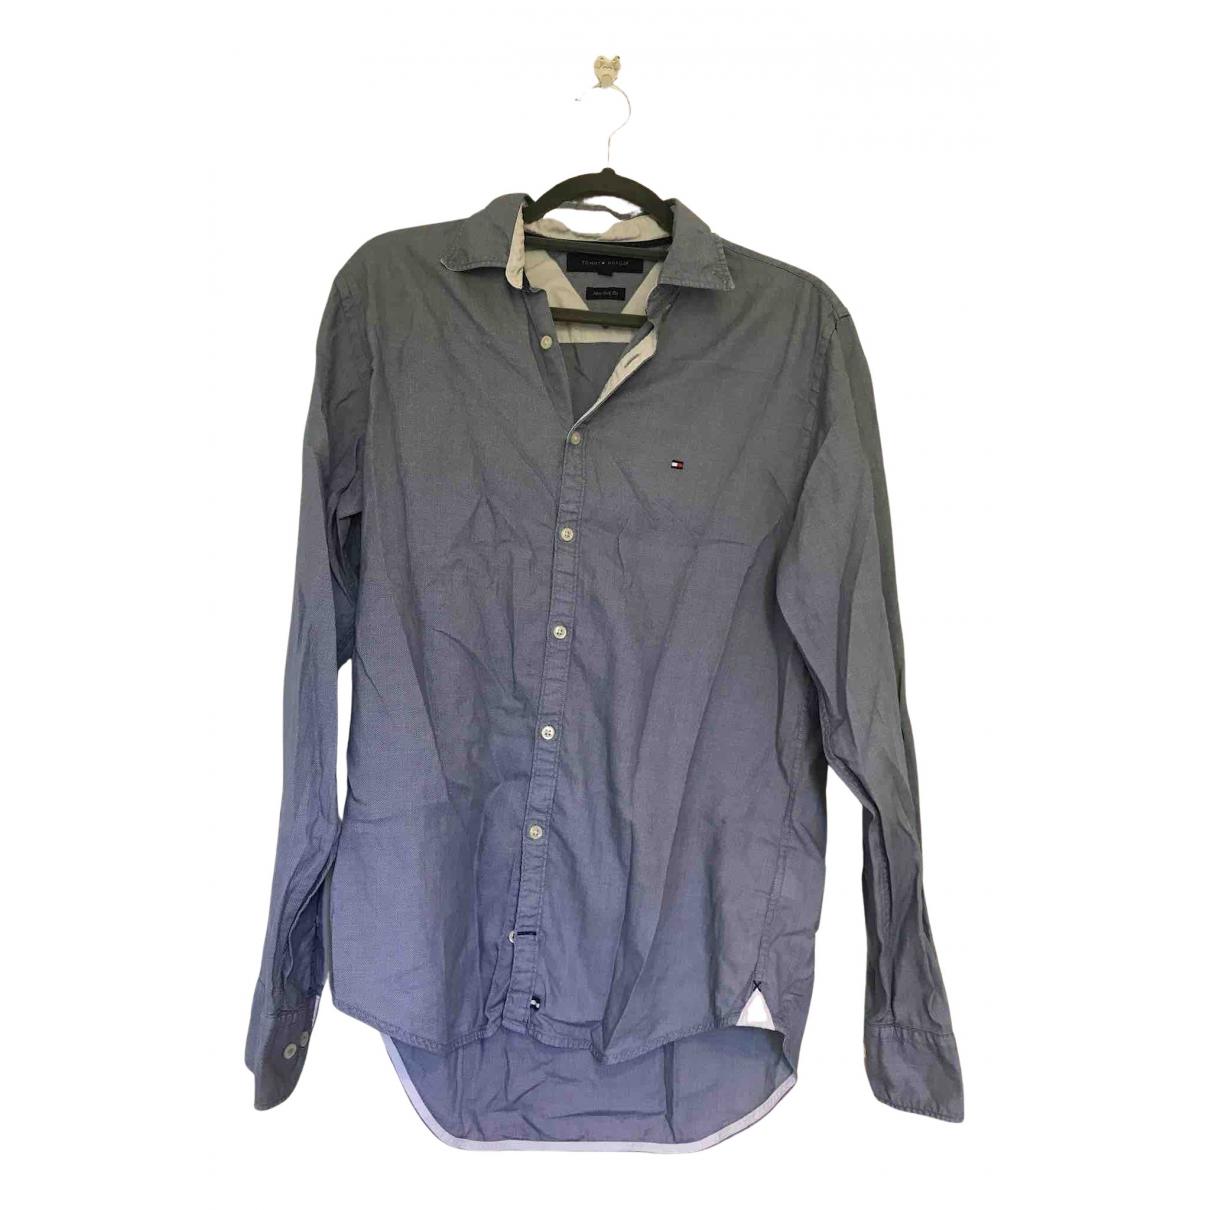 Tommy Hilfiger N Blue Cotton Shirts for Men S International